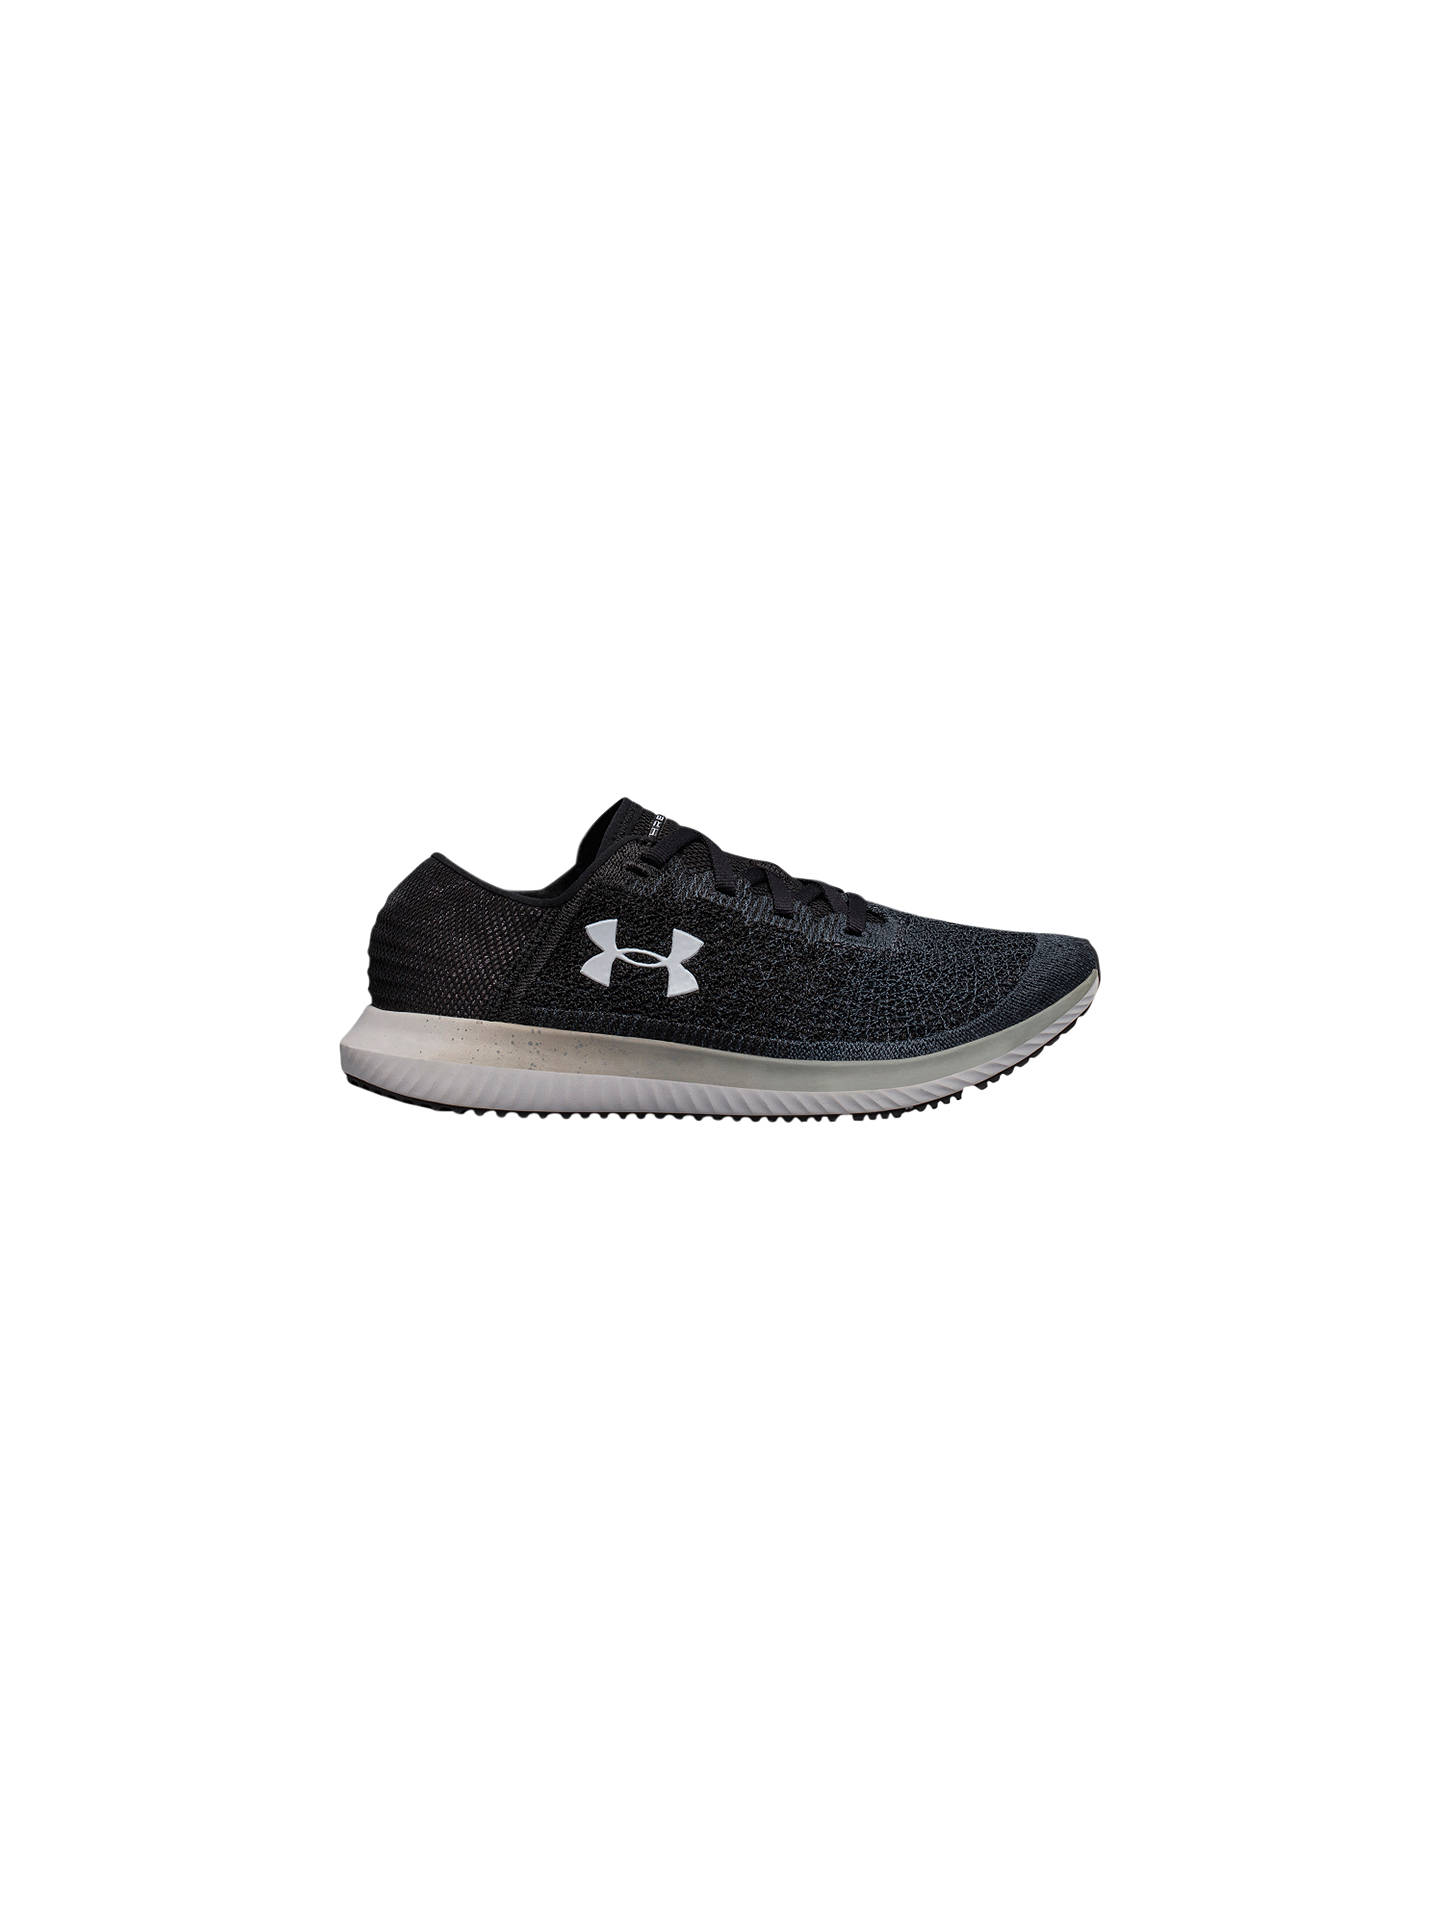 1453821592b Buy Under Armour Threadborne Blur Women s Running Shoes